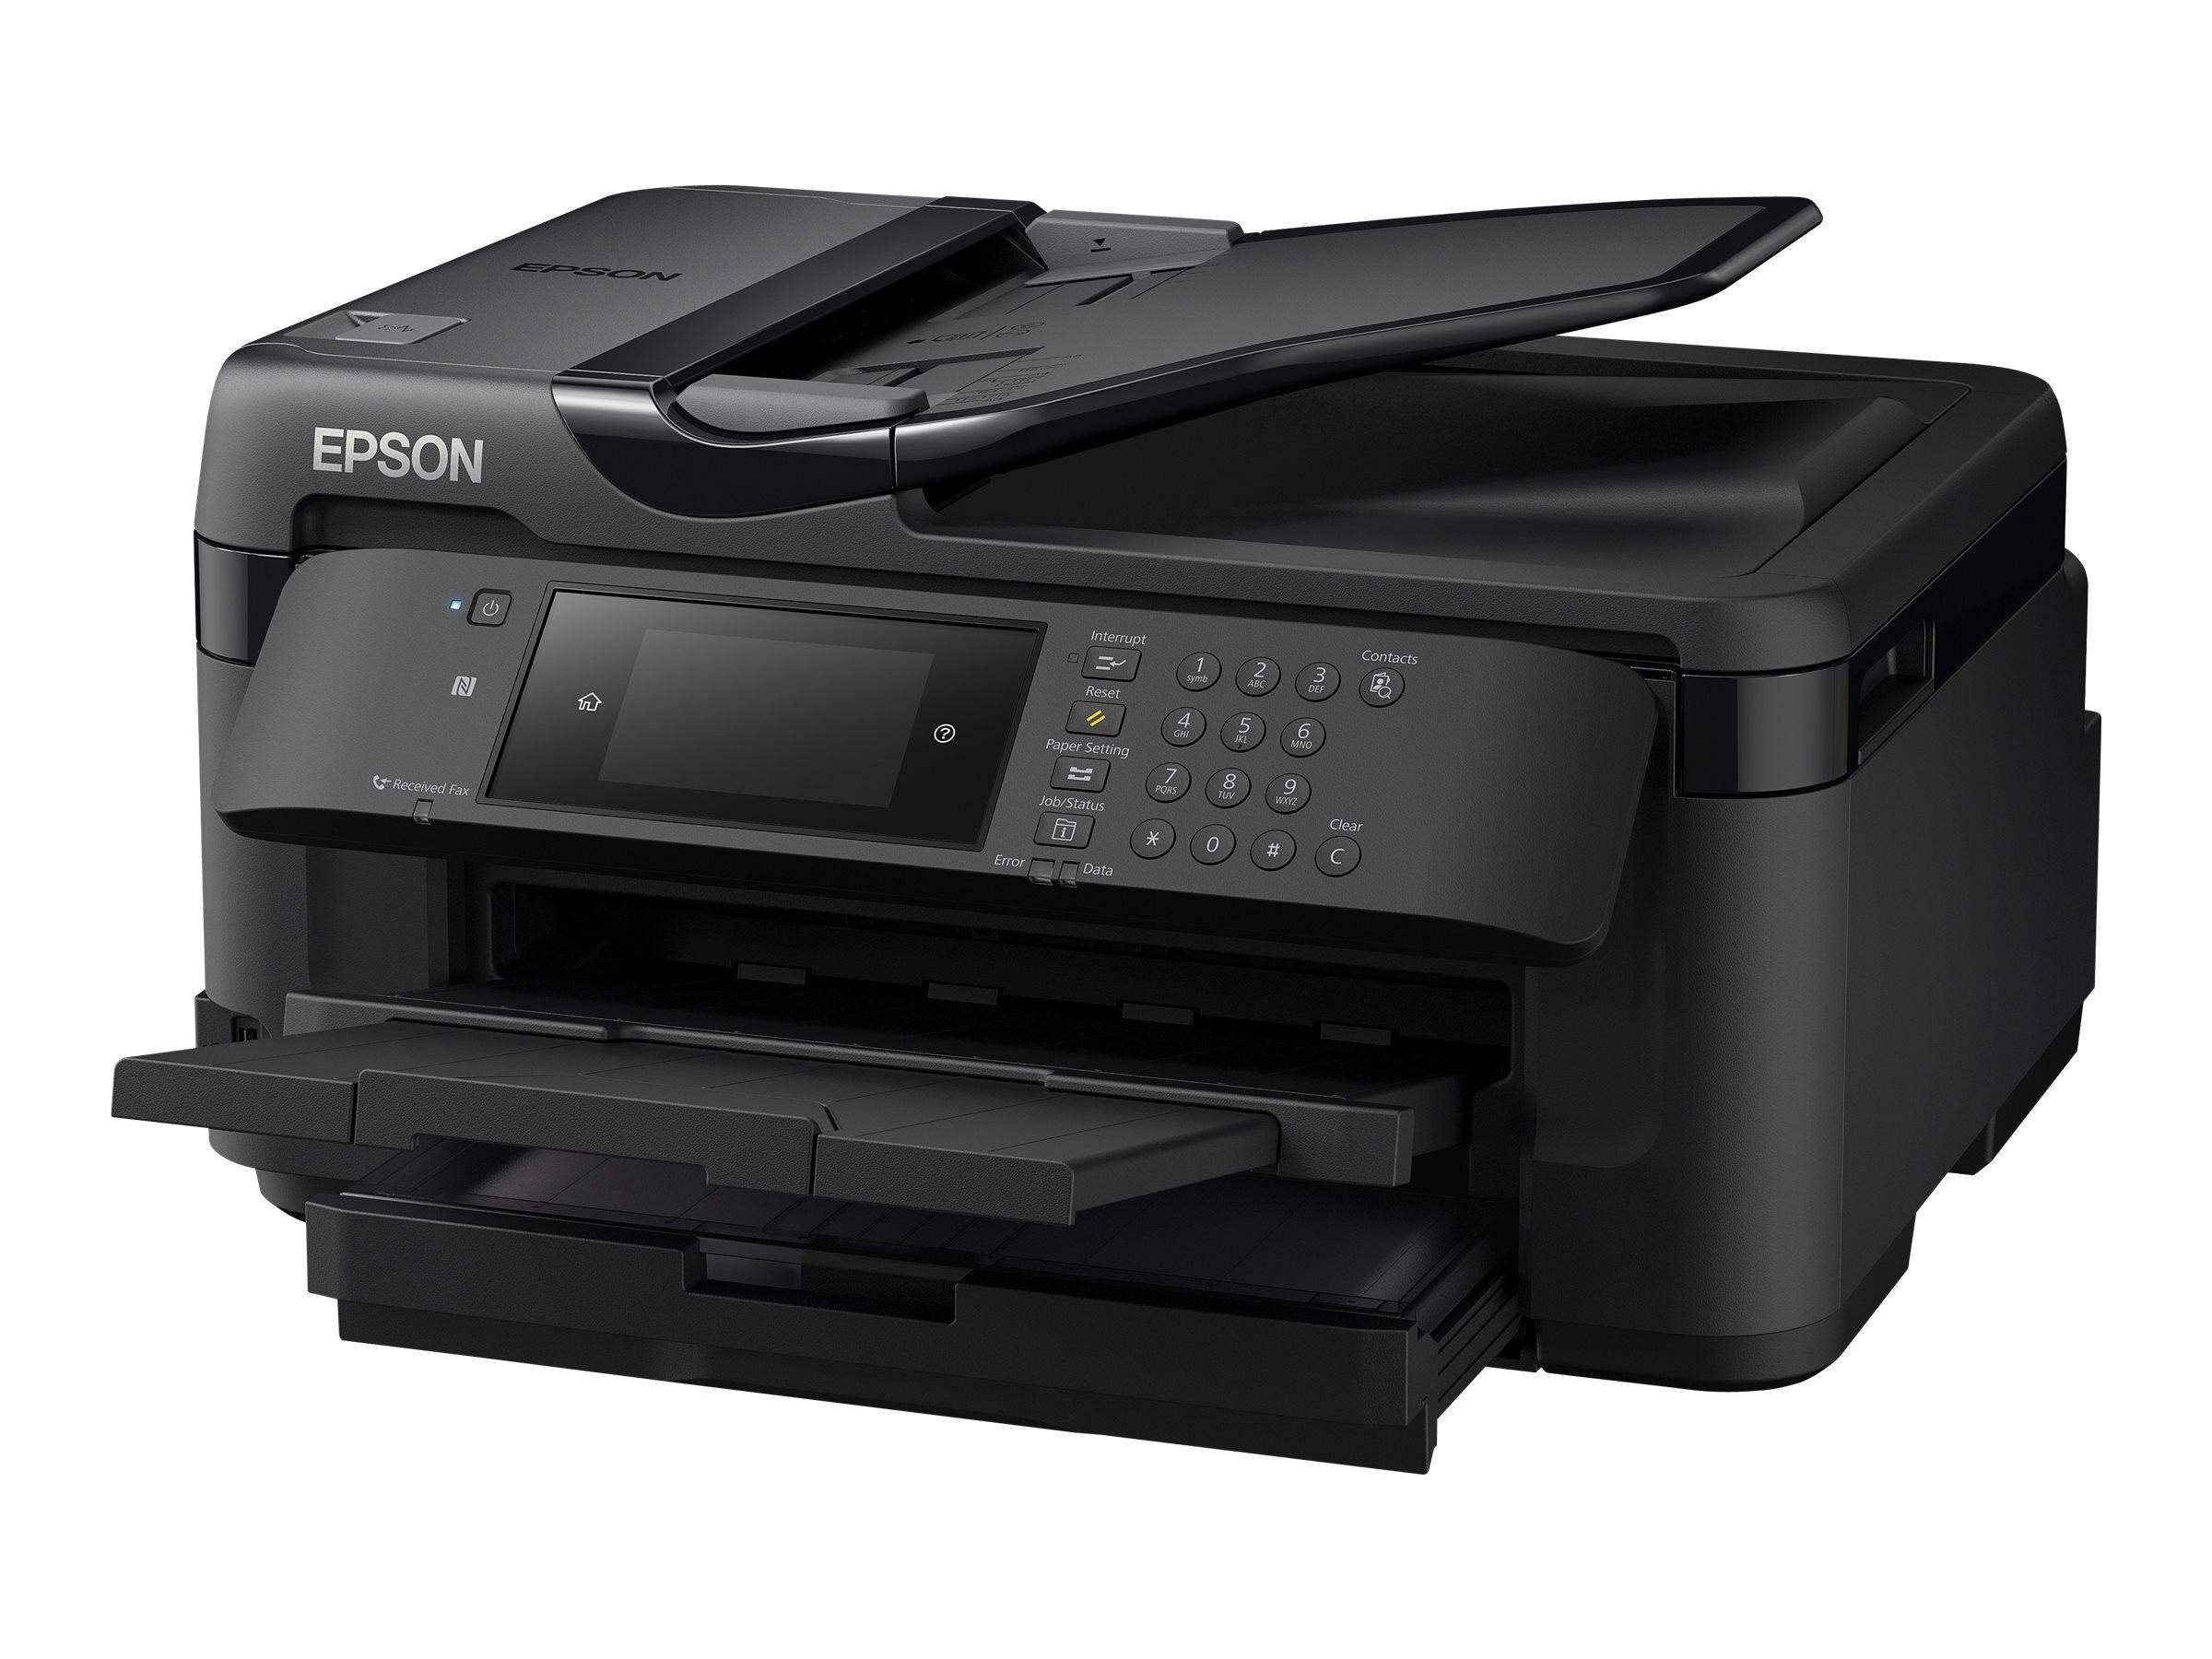 Epson WorkForce WF-7710DWF - Multifunktionsdrucker - Farbe - Tintenstrahl - A3 (Medien)